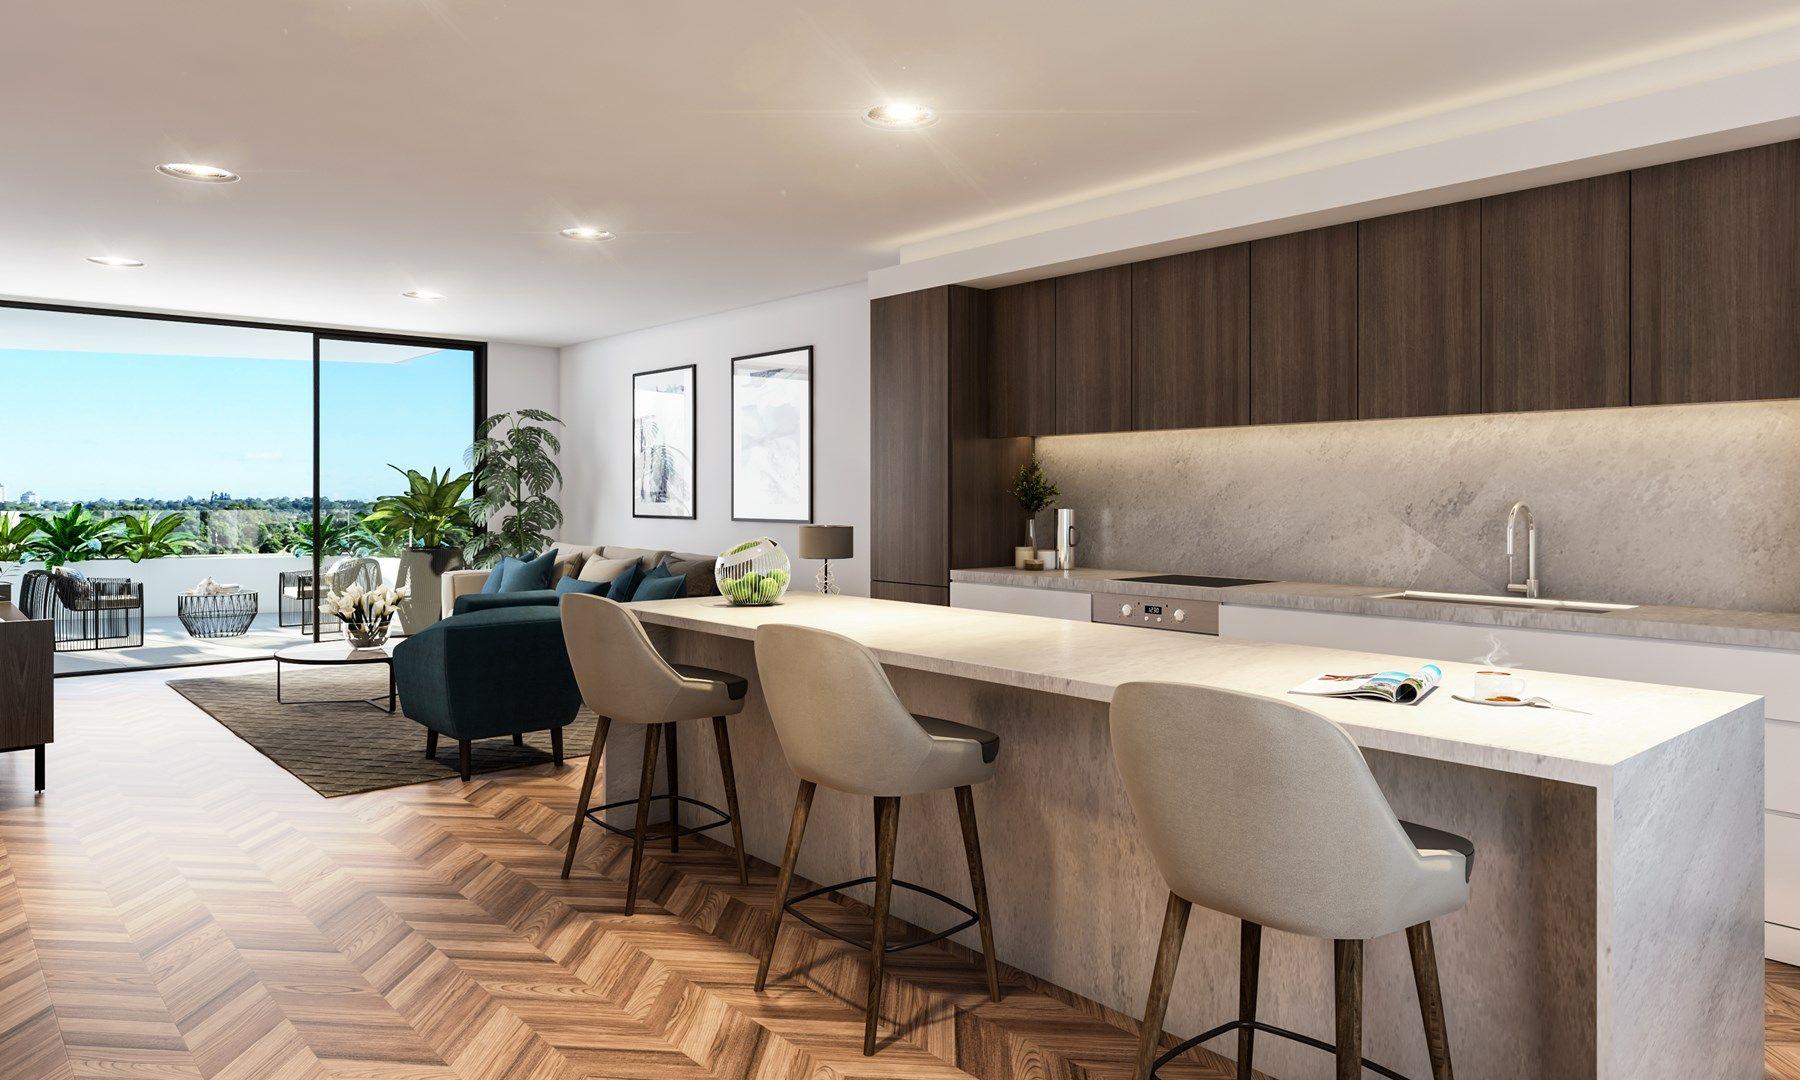 52-54 Chandos Street, St Leonards, NSW 2065, Image 0